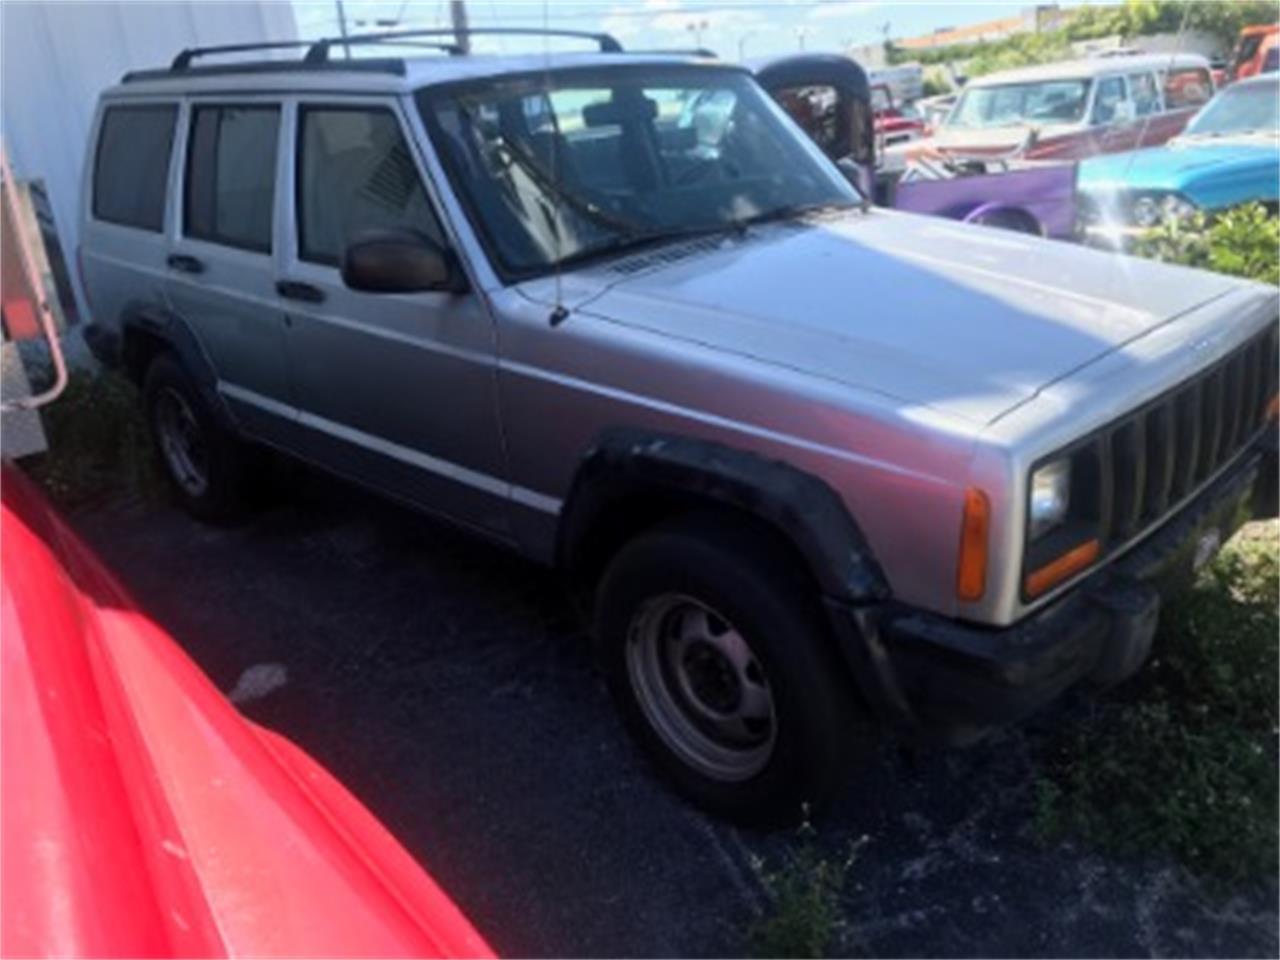 for sale 1989 jeep cherokee in miami, florida cars - miami, fl at geebo